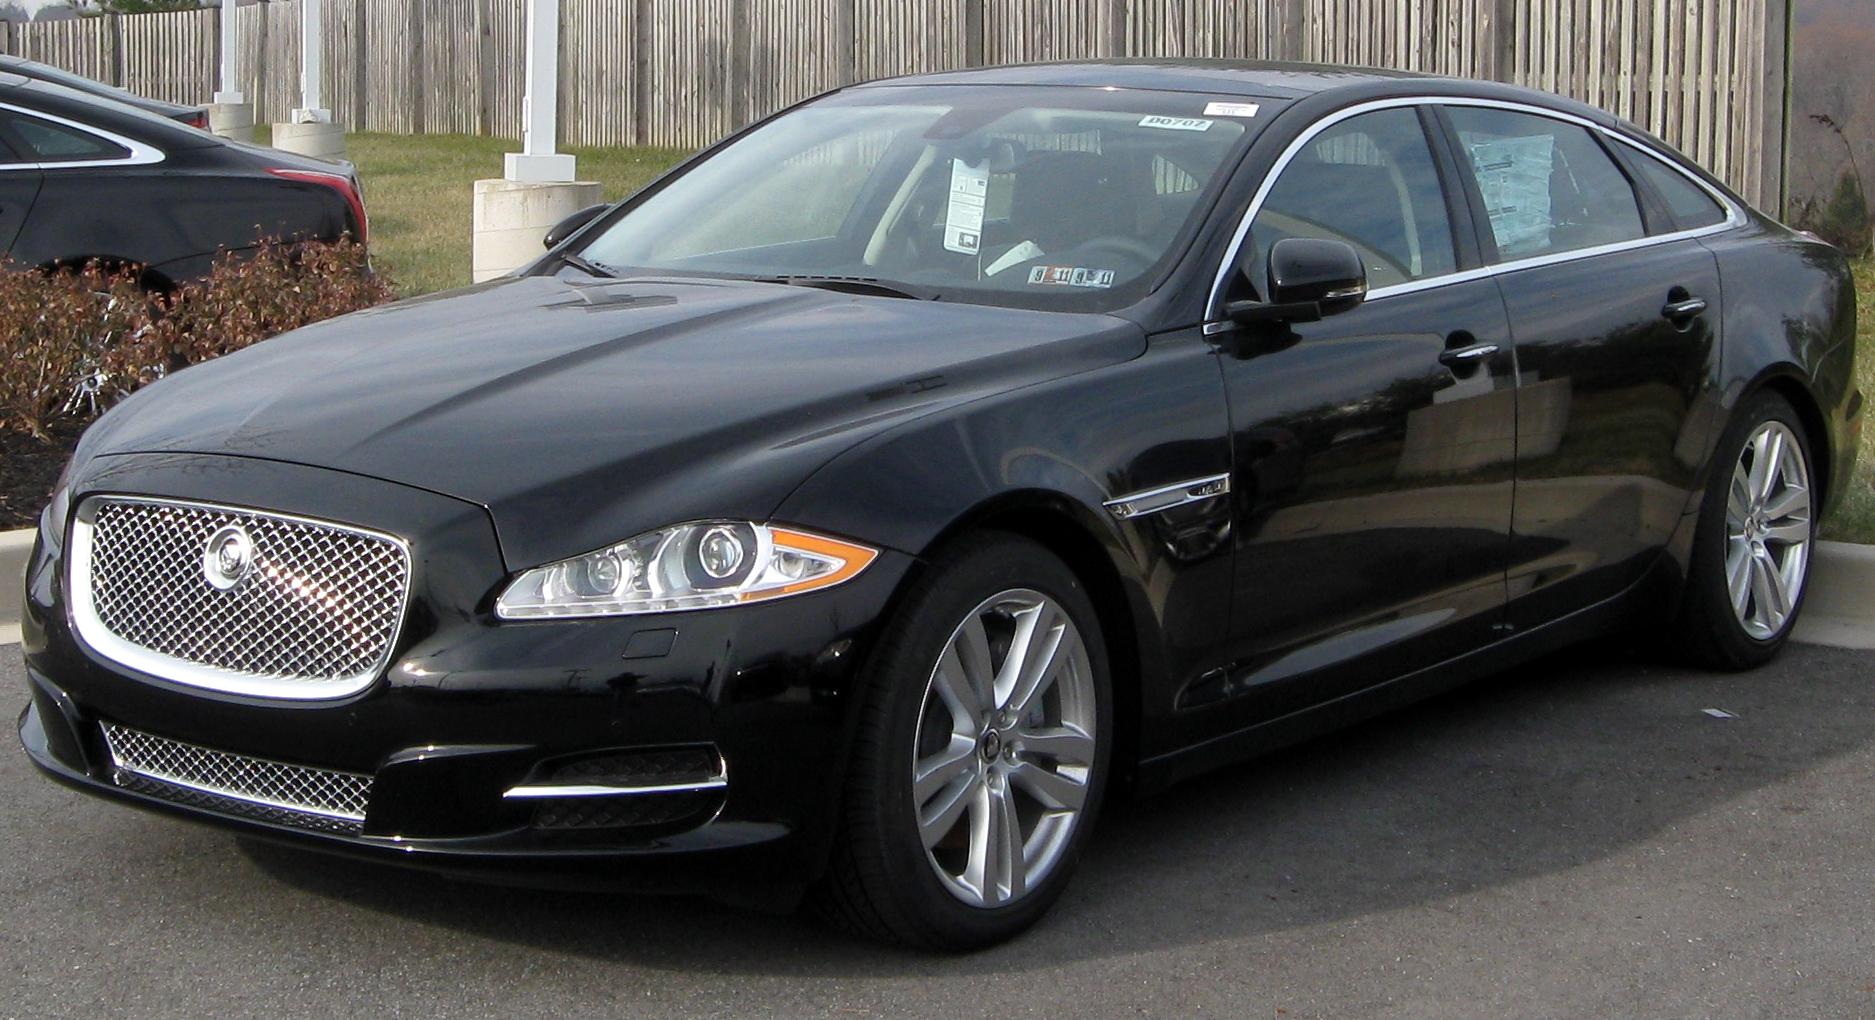 File:2011 Jaguar XJ8 -- 12-31-2010.jpg - Wikimedia Commons